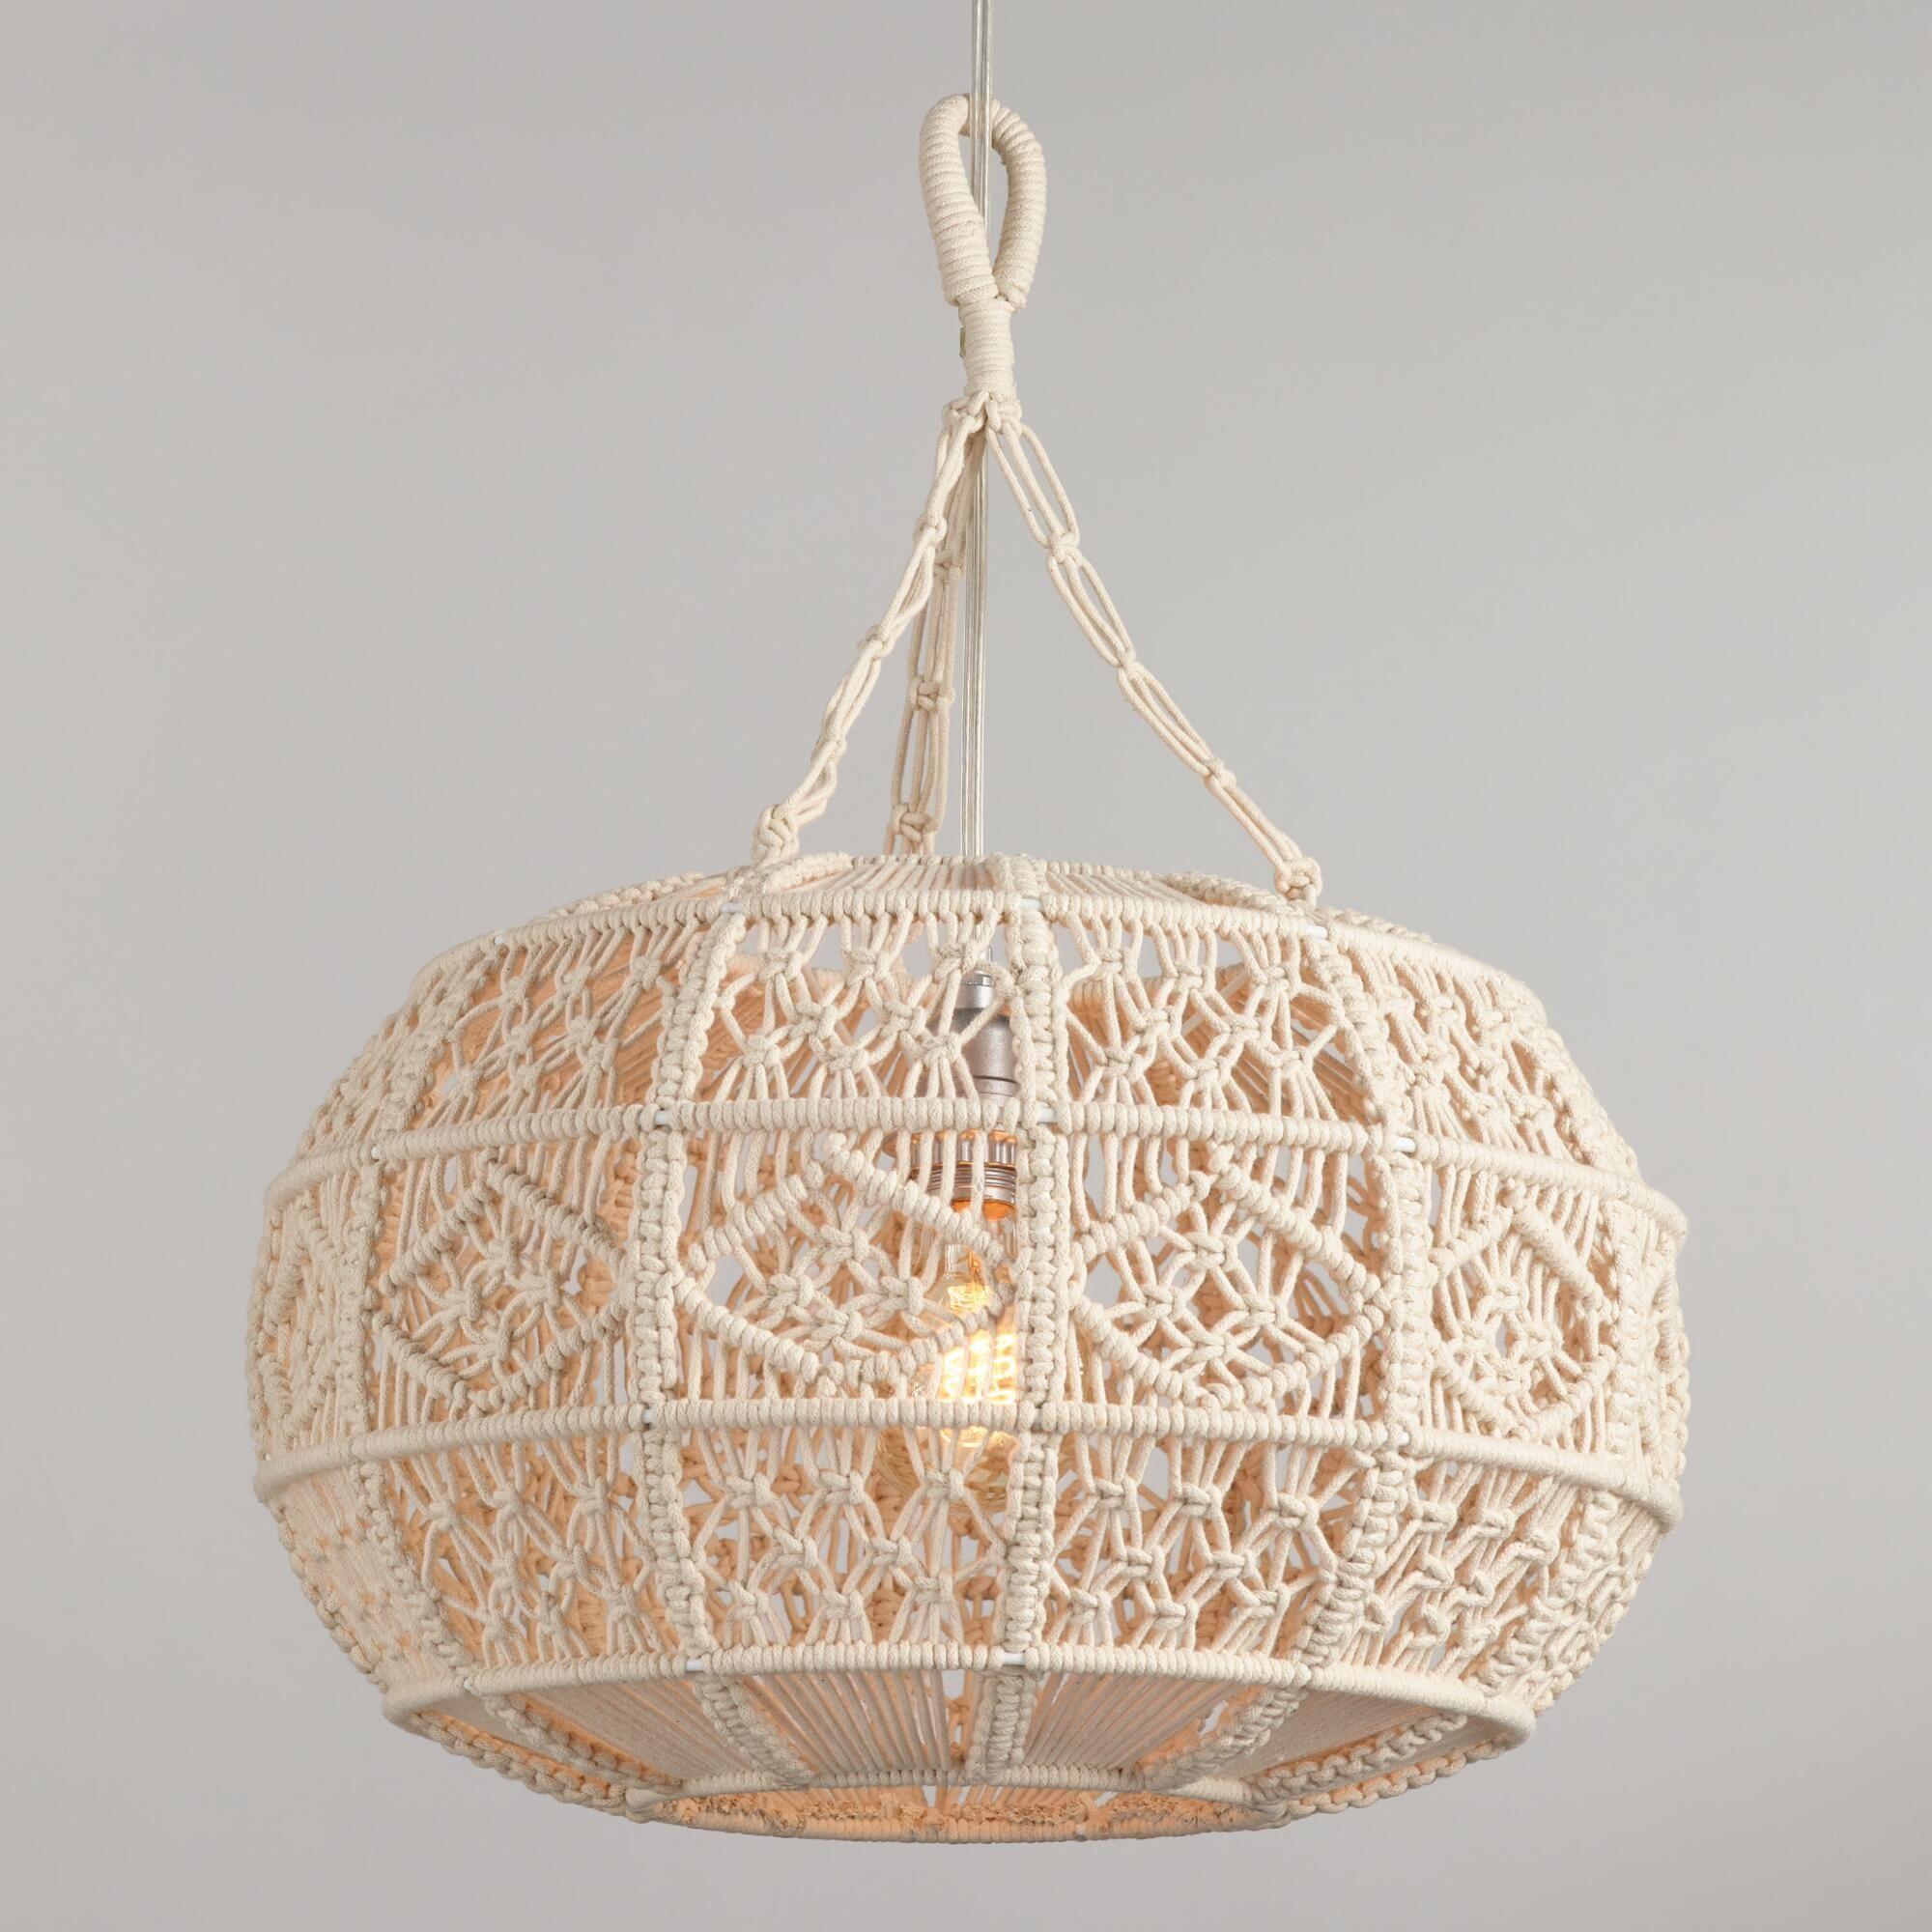 World Lamp Sphere by Ivory MarketMacramé Macrame Pendant MpSzqUGV